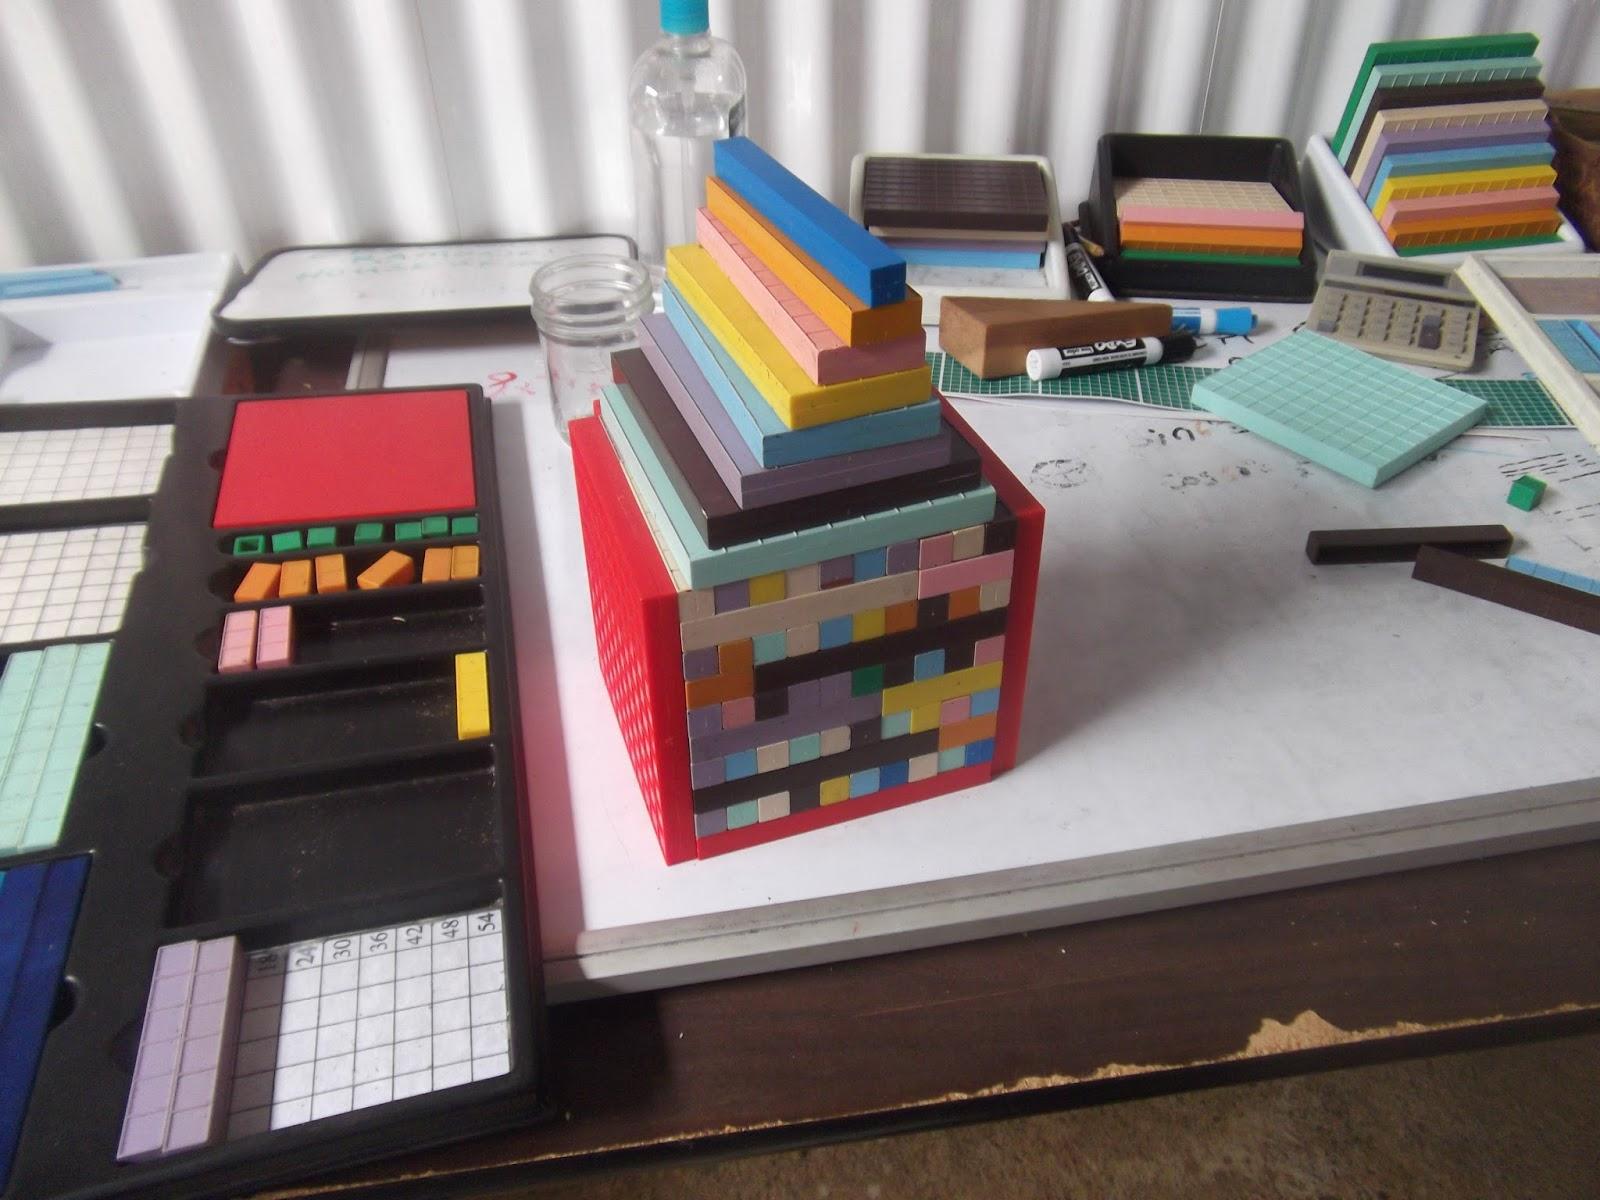 Crewton Ramone S Blog Of Math Base Ten Block Party